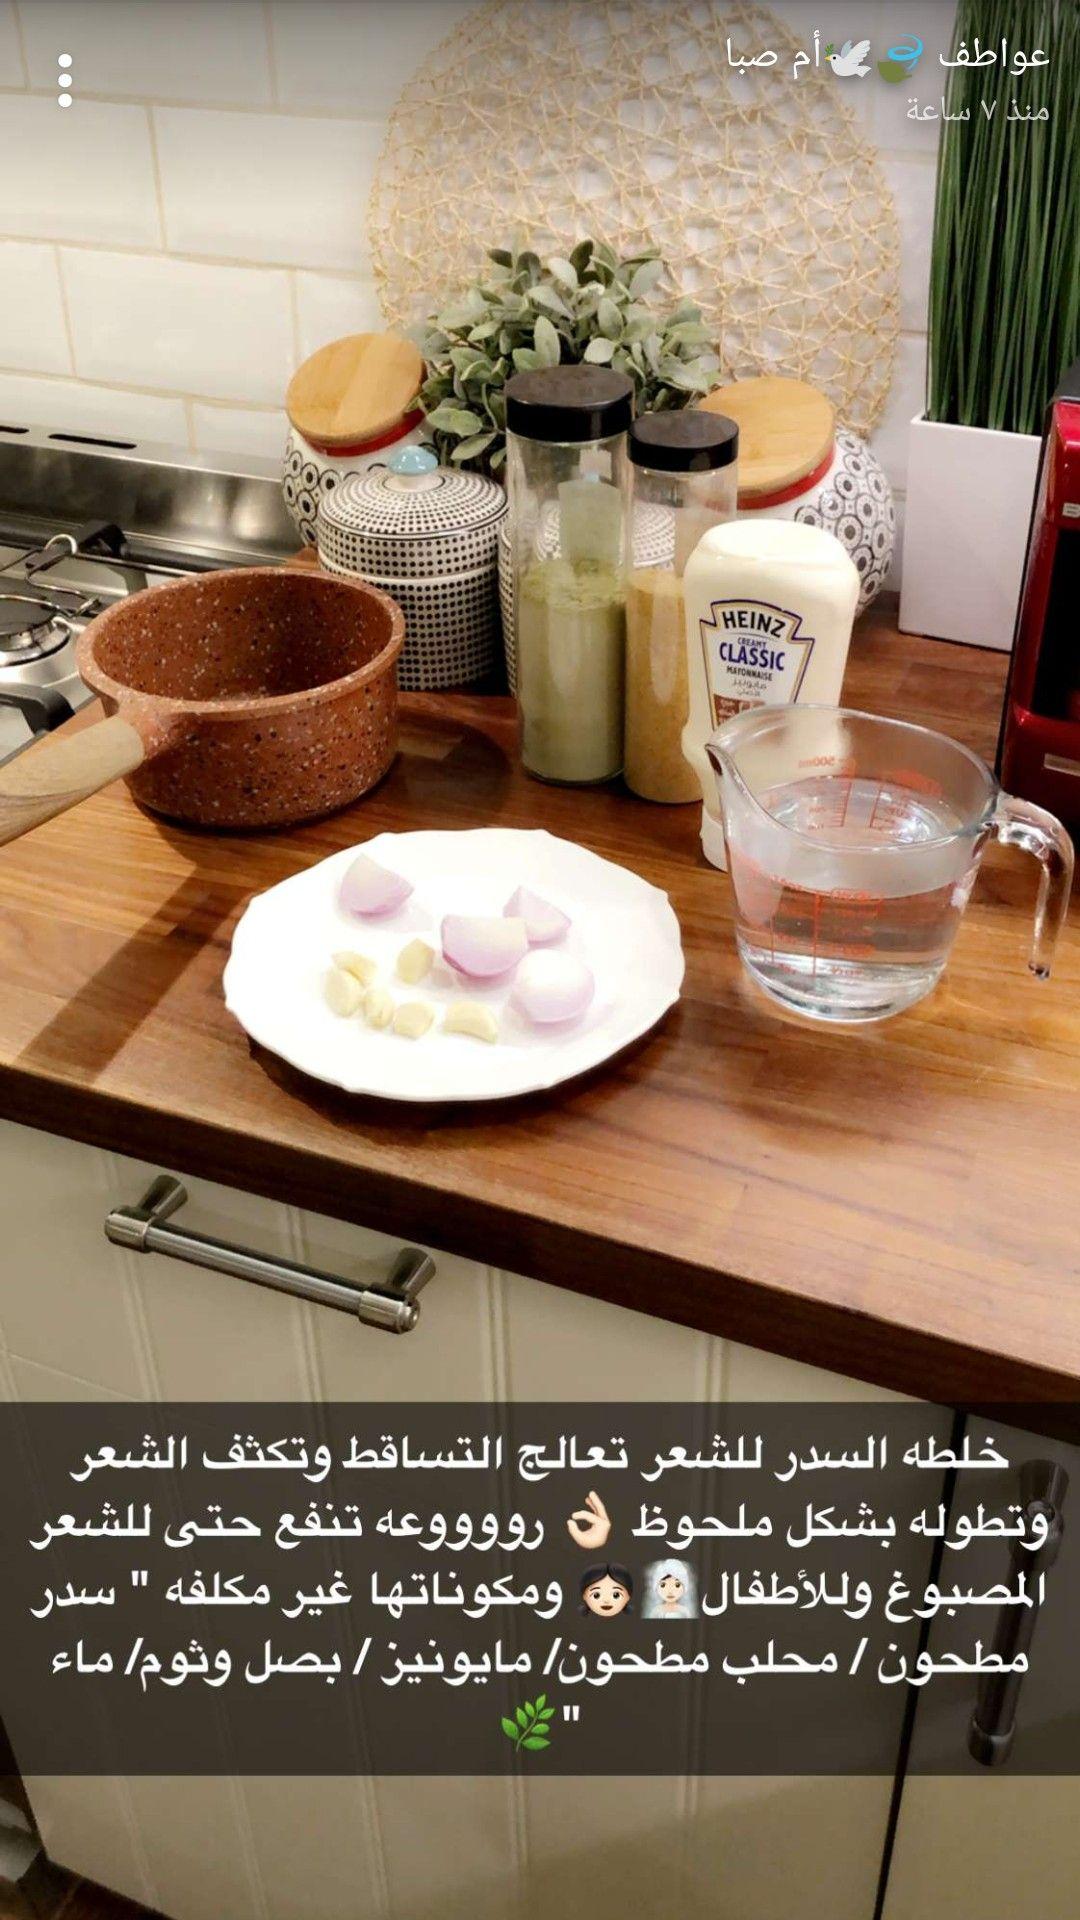 Pin By Raneem On عواطف ام صبا Beauty Care Face Cream Decorative Tray